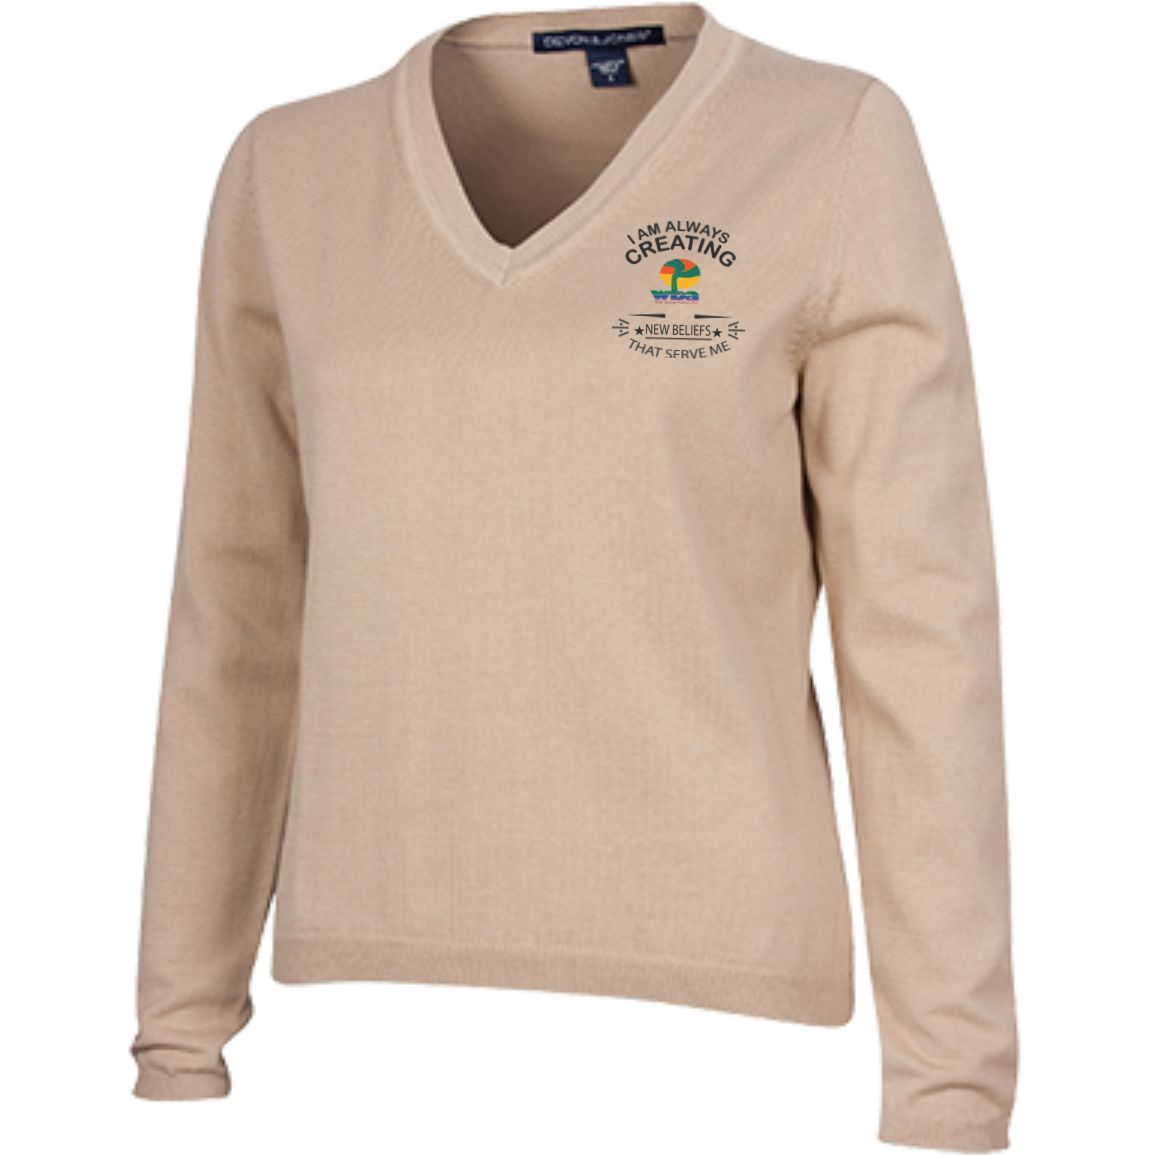 "Customized Spiritual Inspirational Affirmations Ladies V-Neck Sweater ""I Am Creating. . ."""